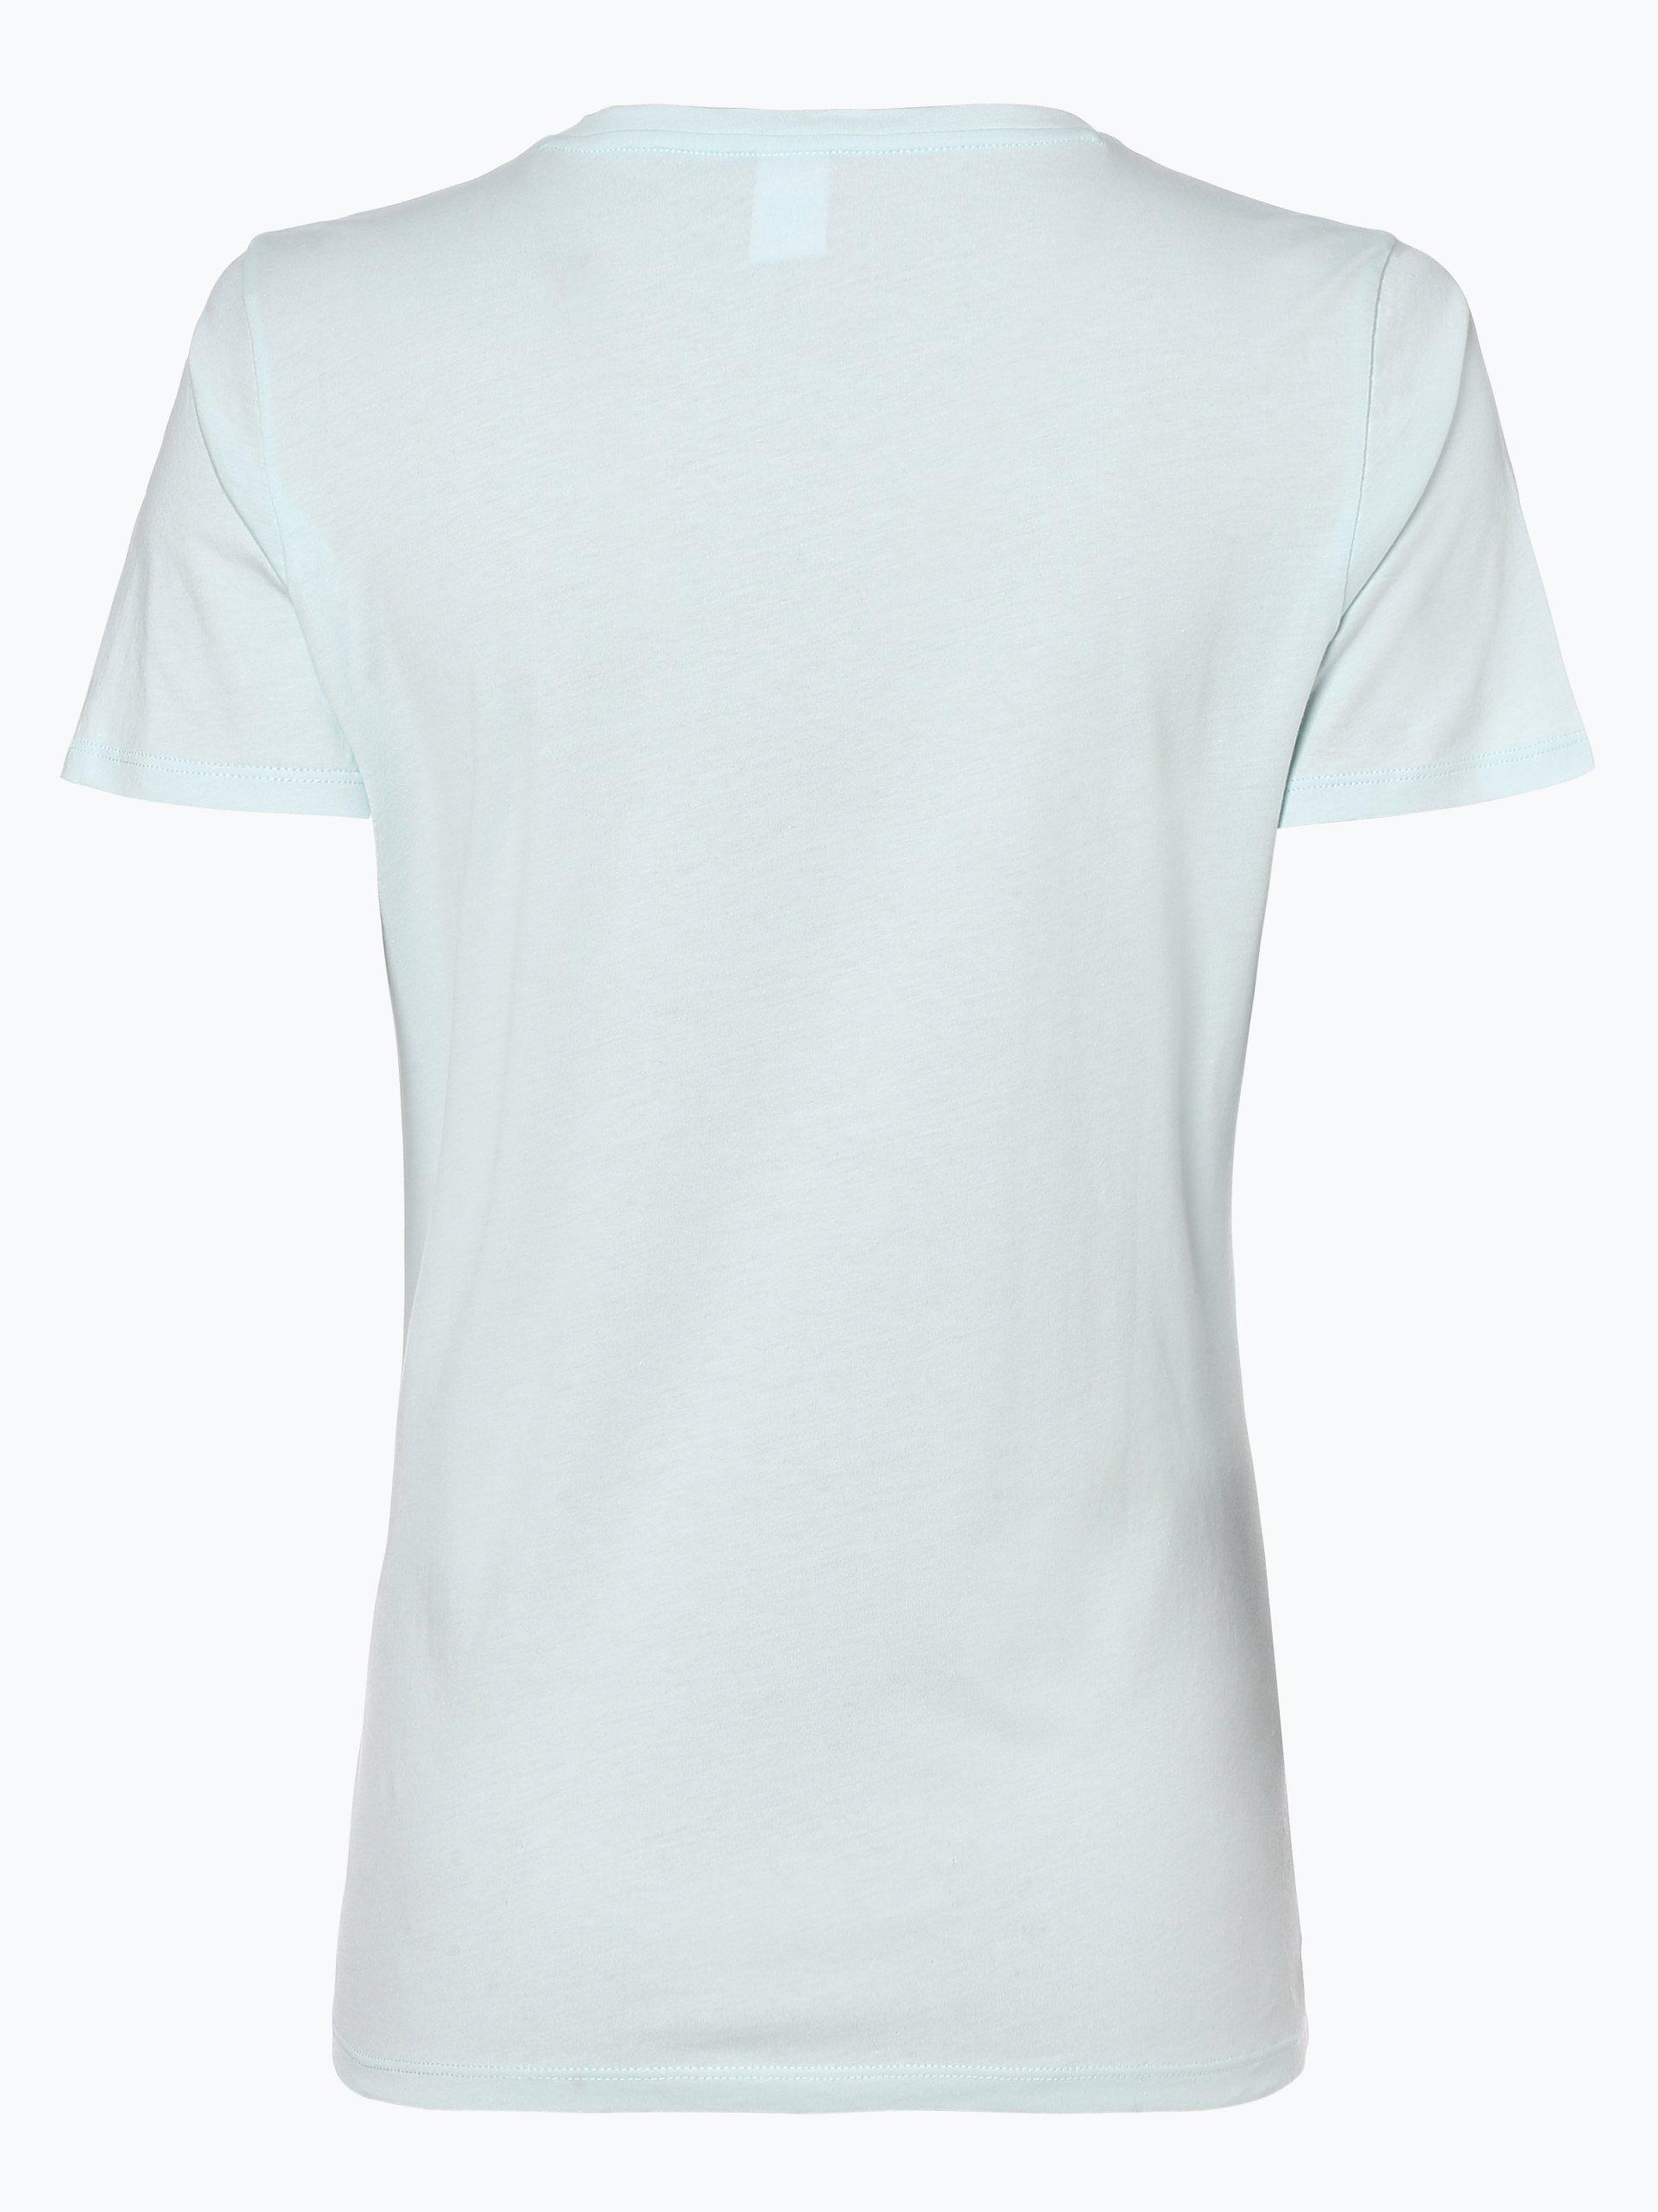 BOSS Casual Damen T-Shirt - Teblurred